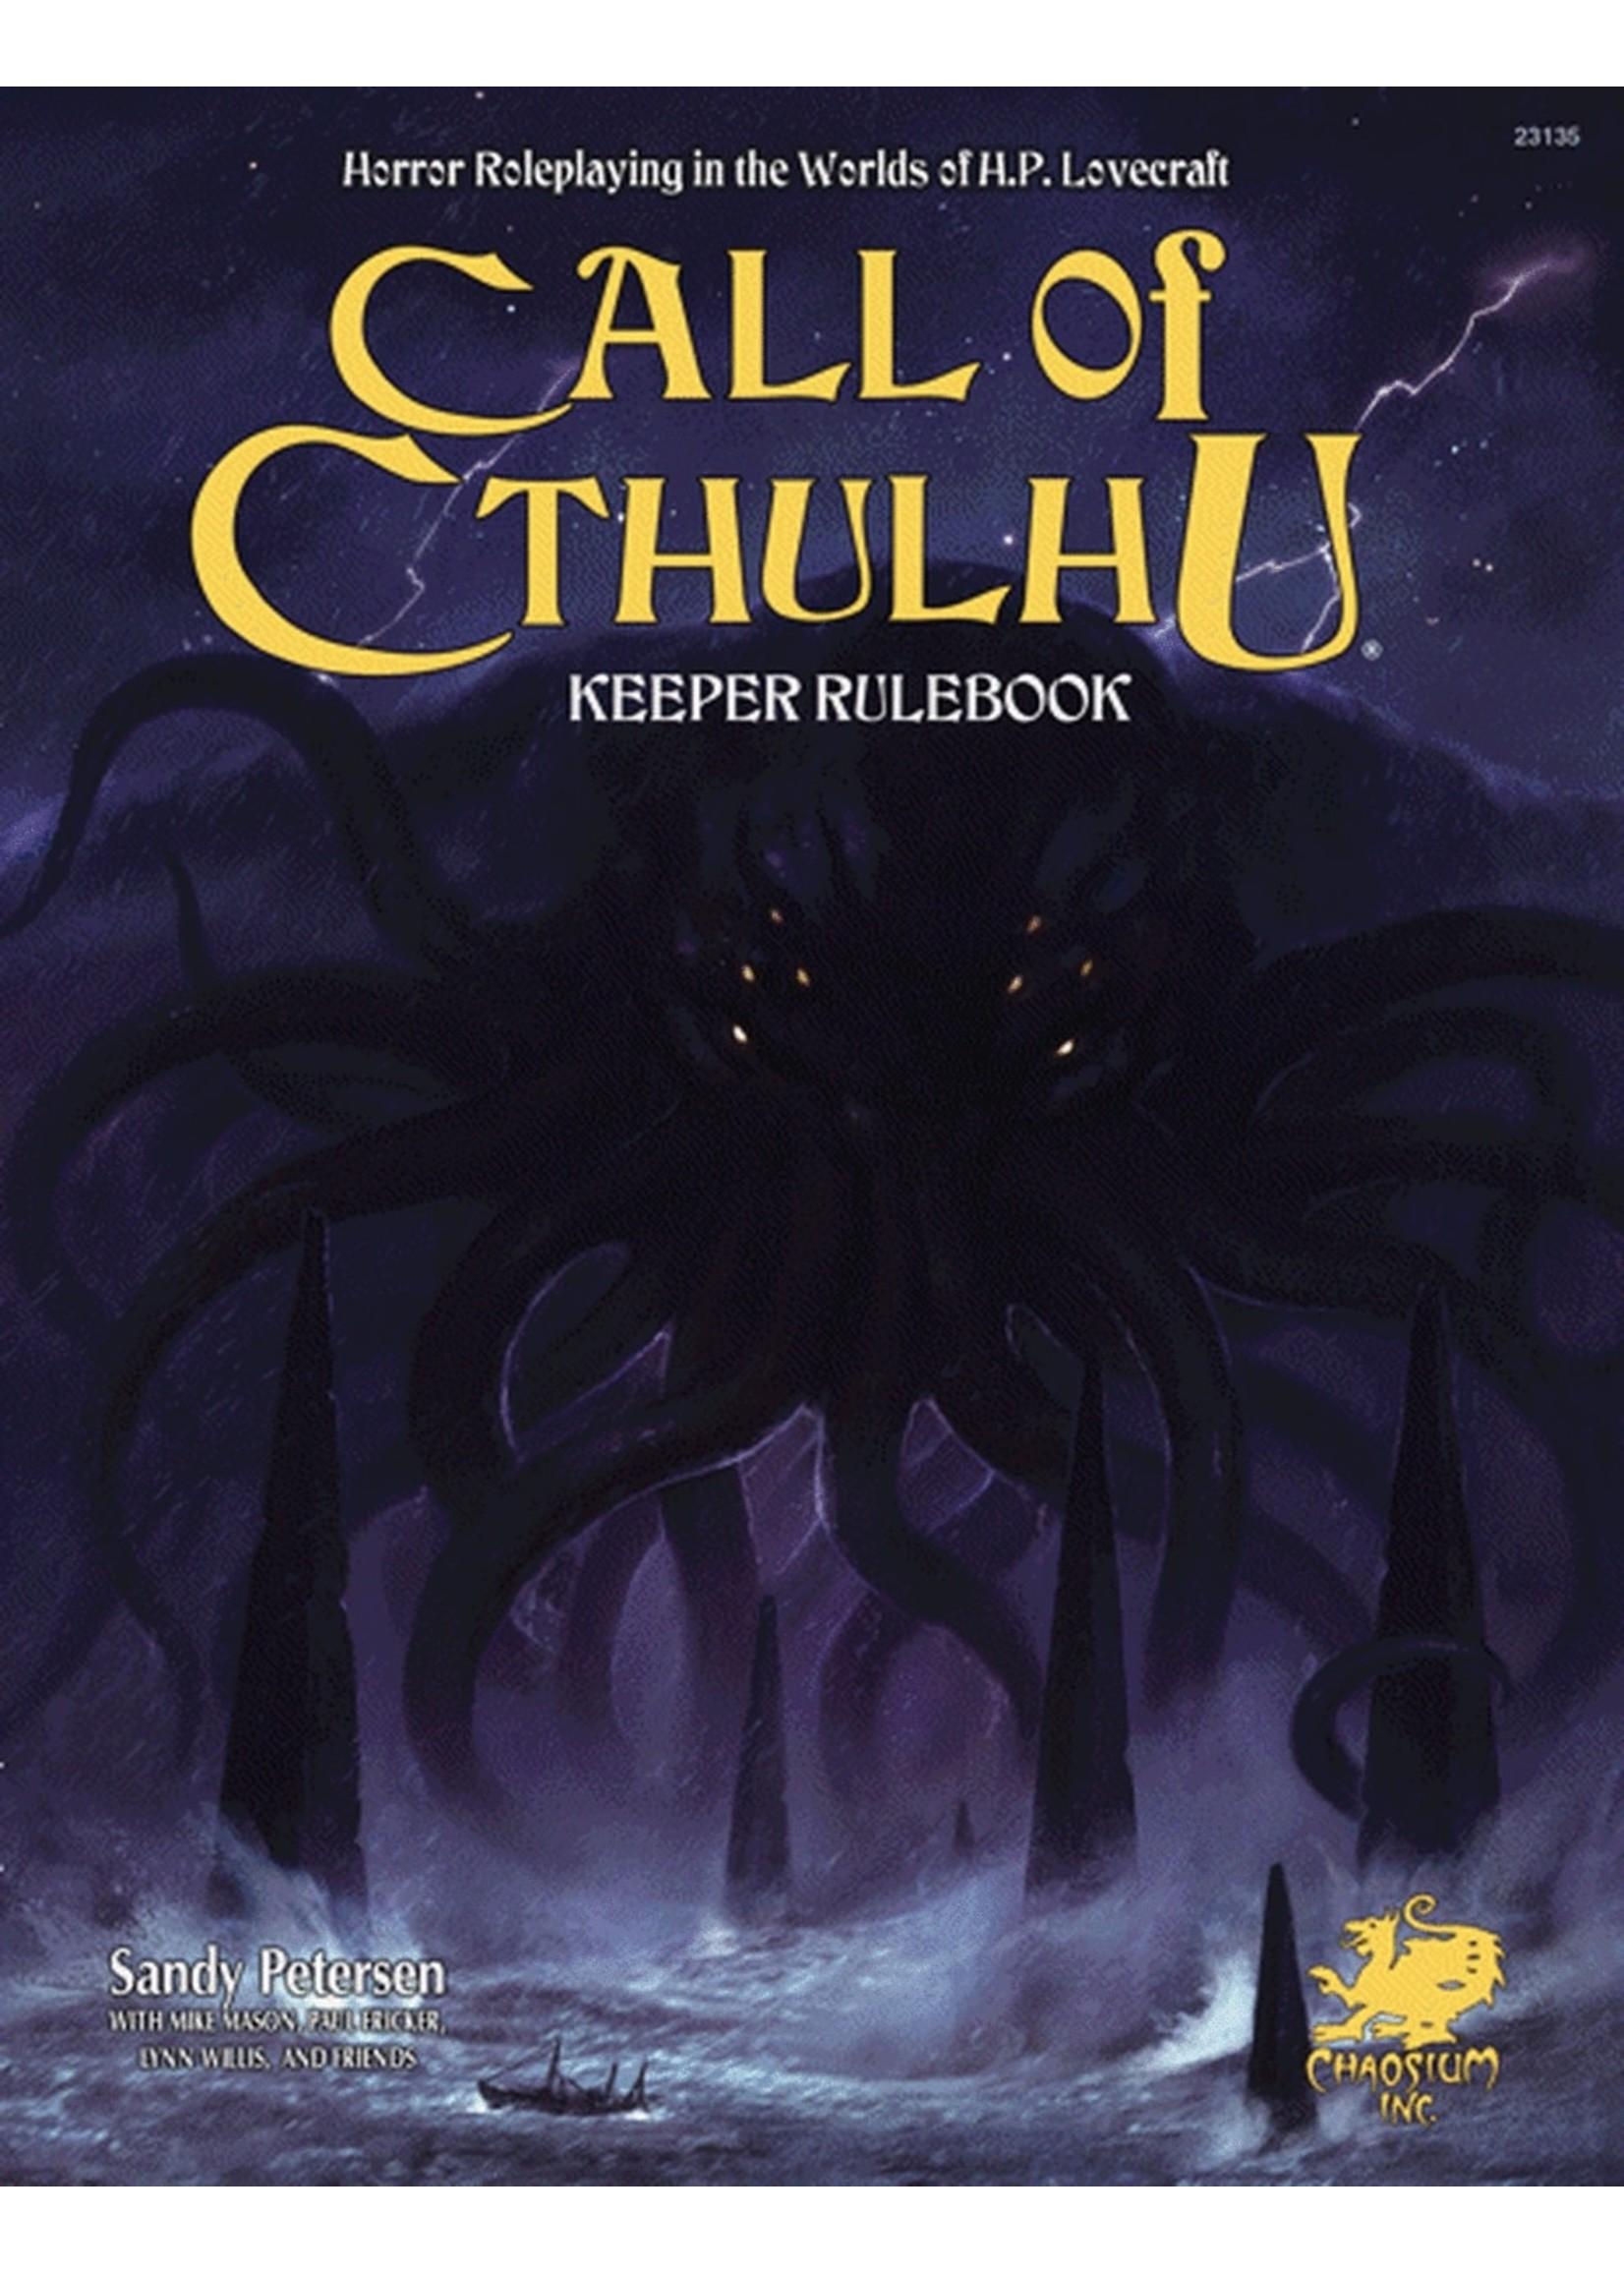 Call of Cthulhu 7th Ed